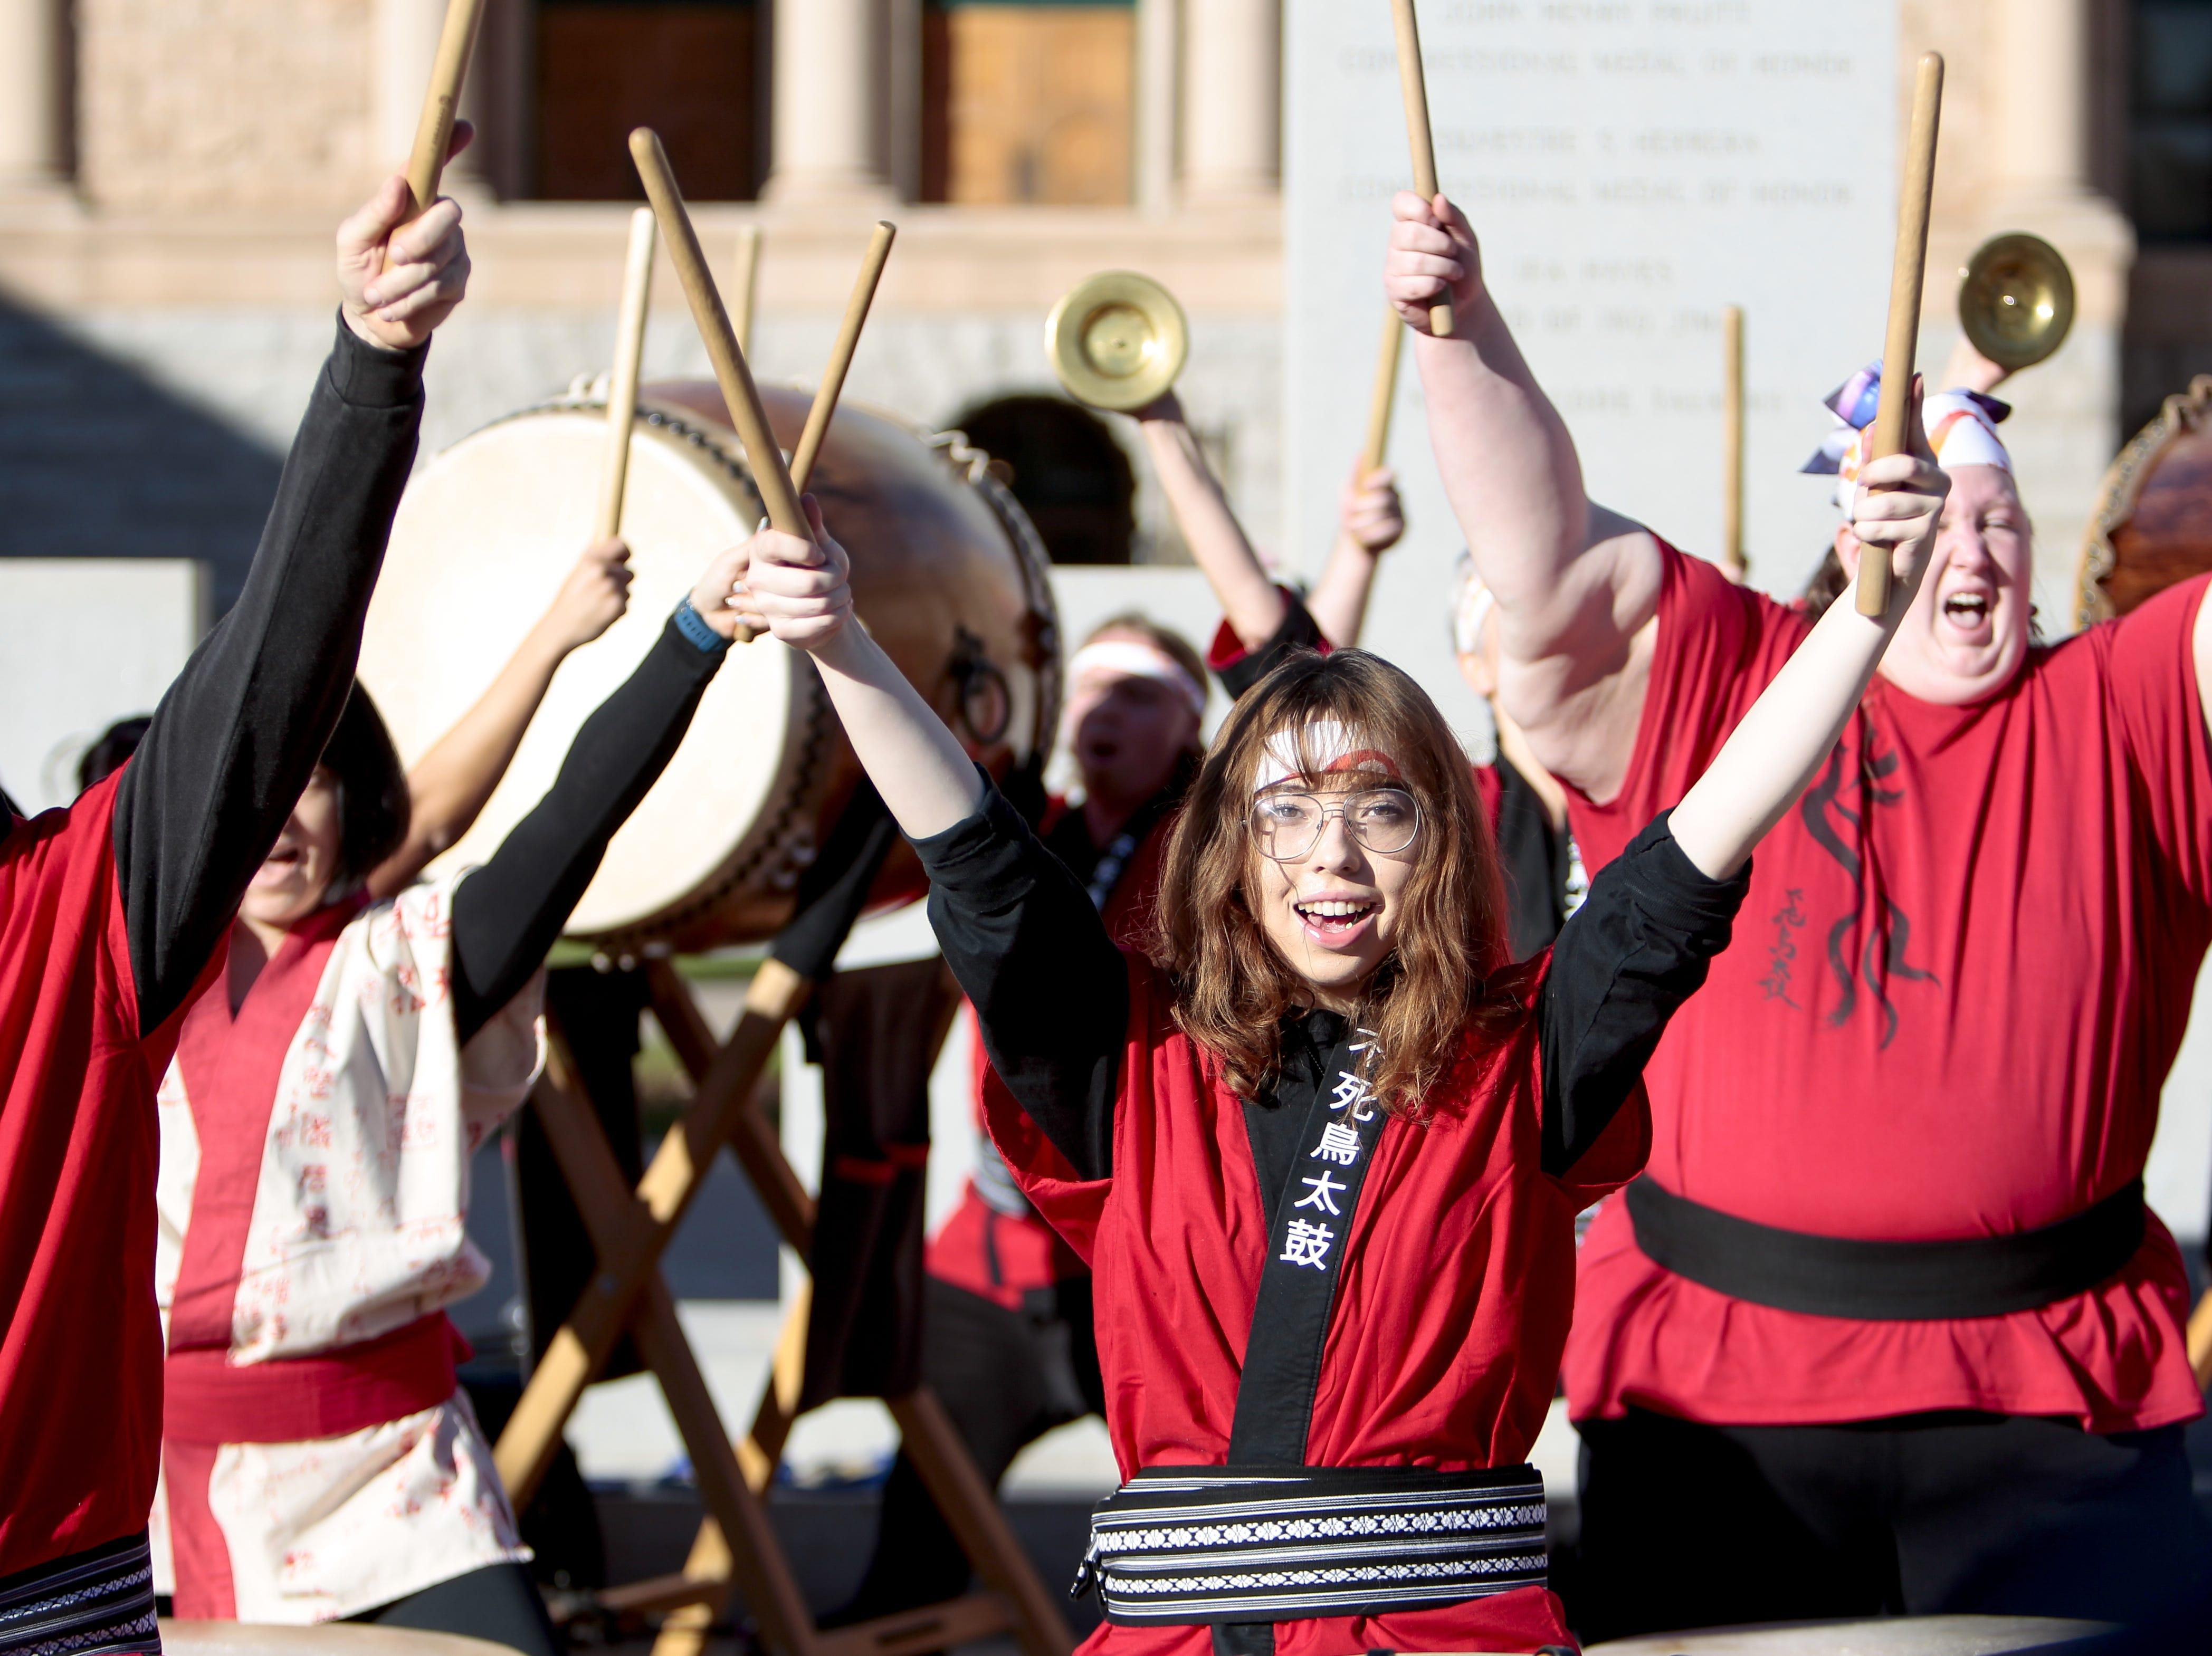 Sammie Barnes, 17, performs with the Fushiko Daiko Dojo at the Phoenix Women's March on Jan. 19, 2019, at the Arizona Capitol.